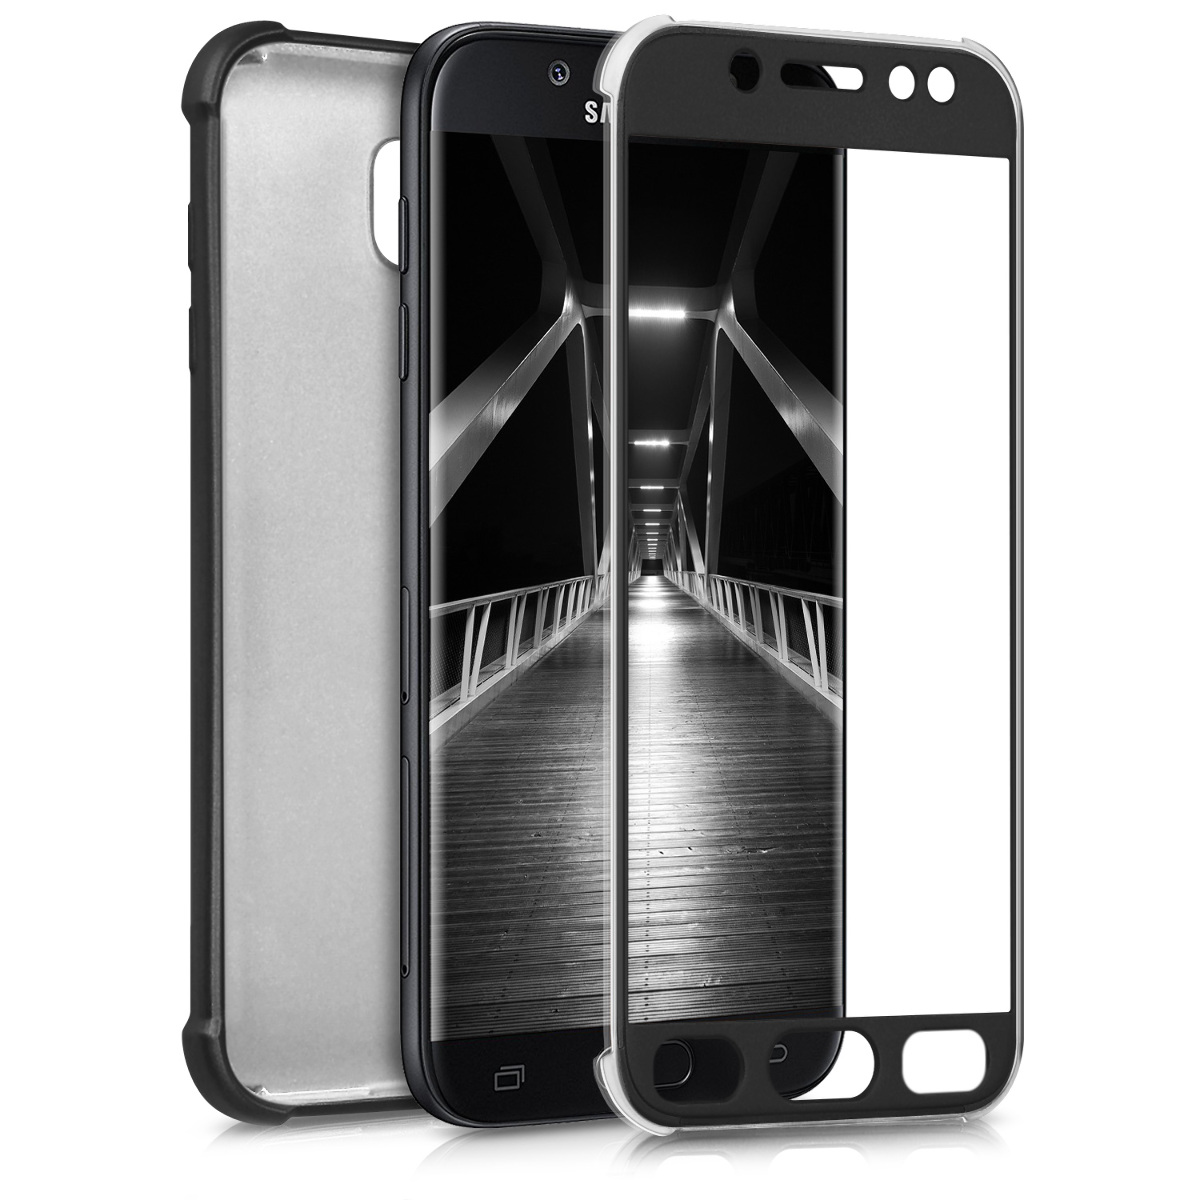 KW Θήκη Σιλικόνης Full Body Samsung Galaxy J5 (2017) DUOS - Soft TPU Silicone - Metallic Black (42757.68)